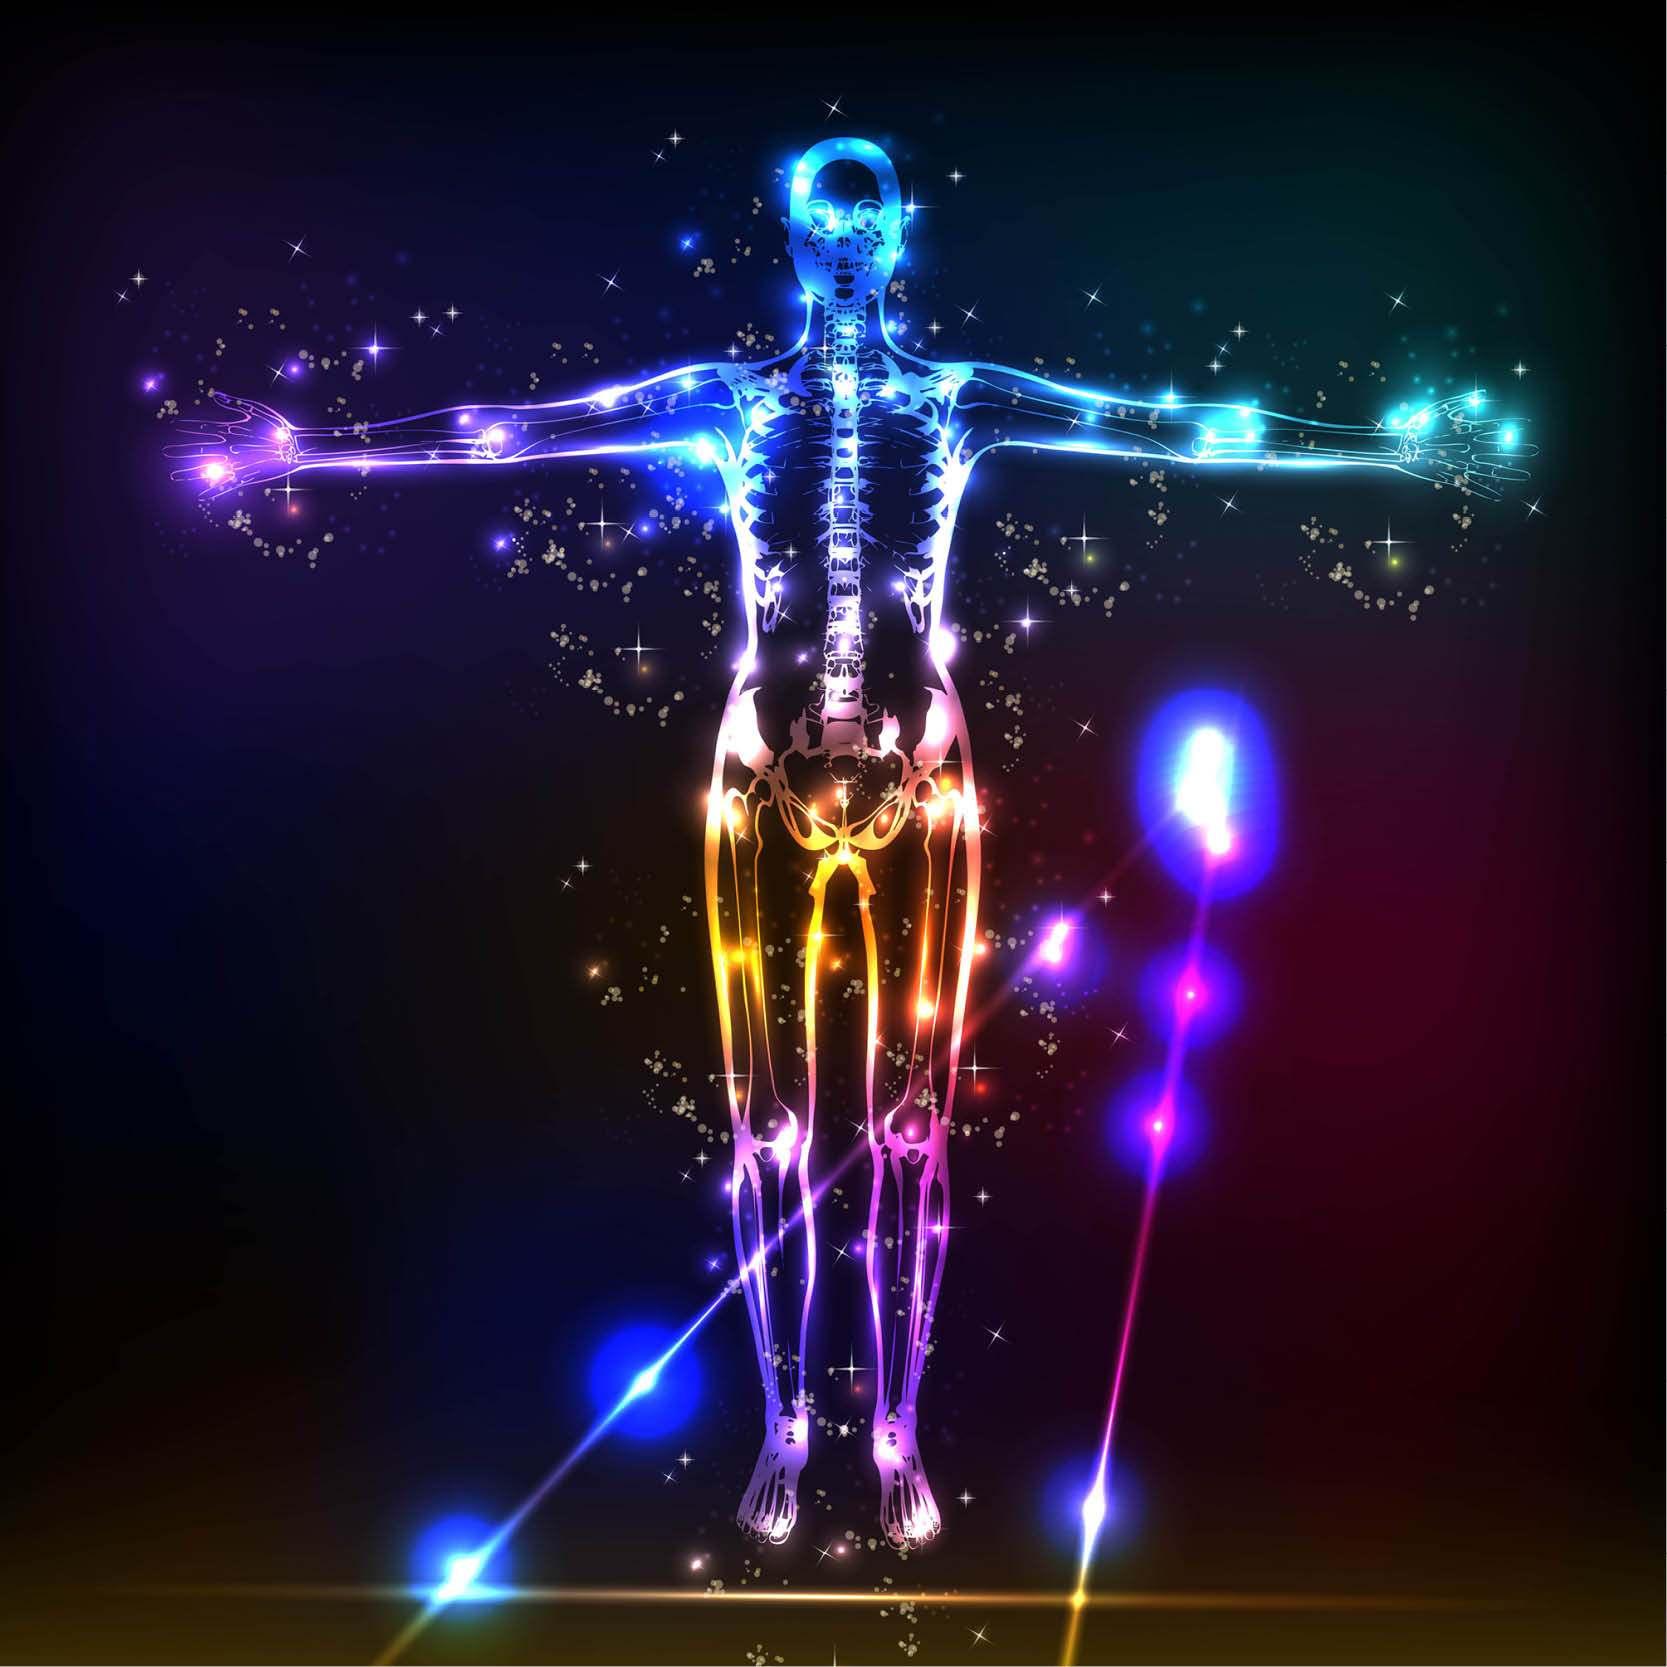 Body like a chain image